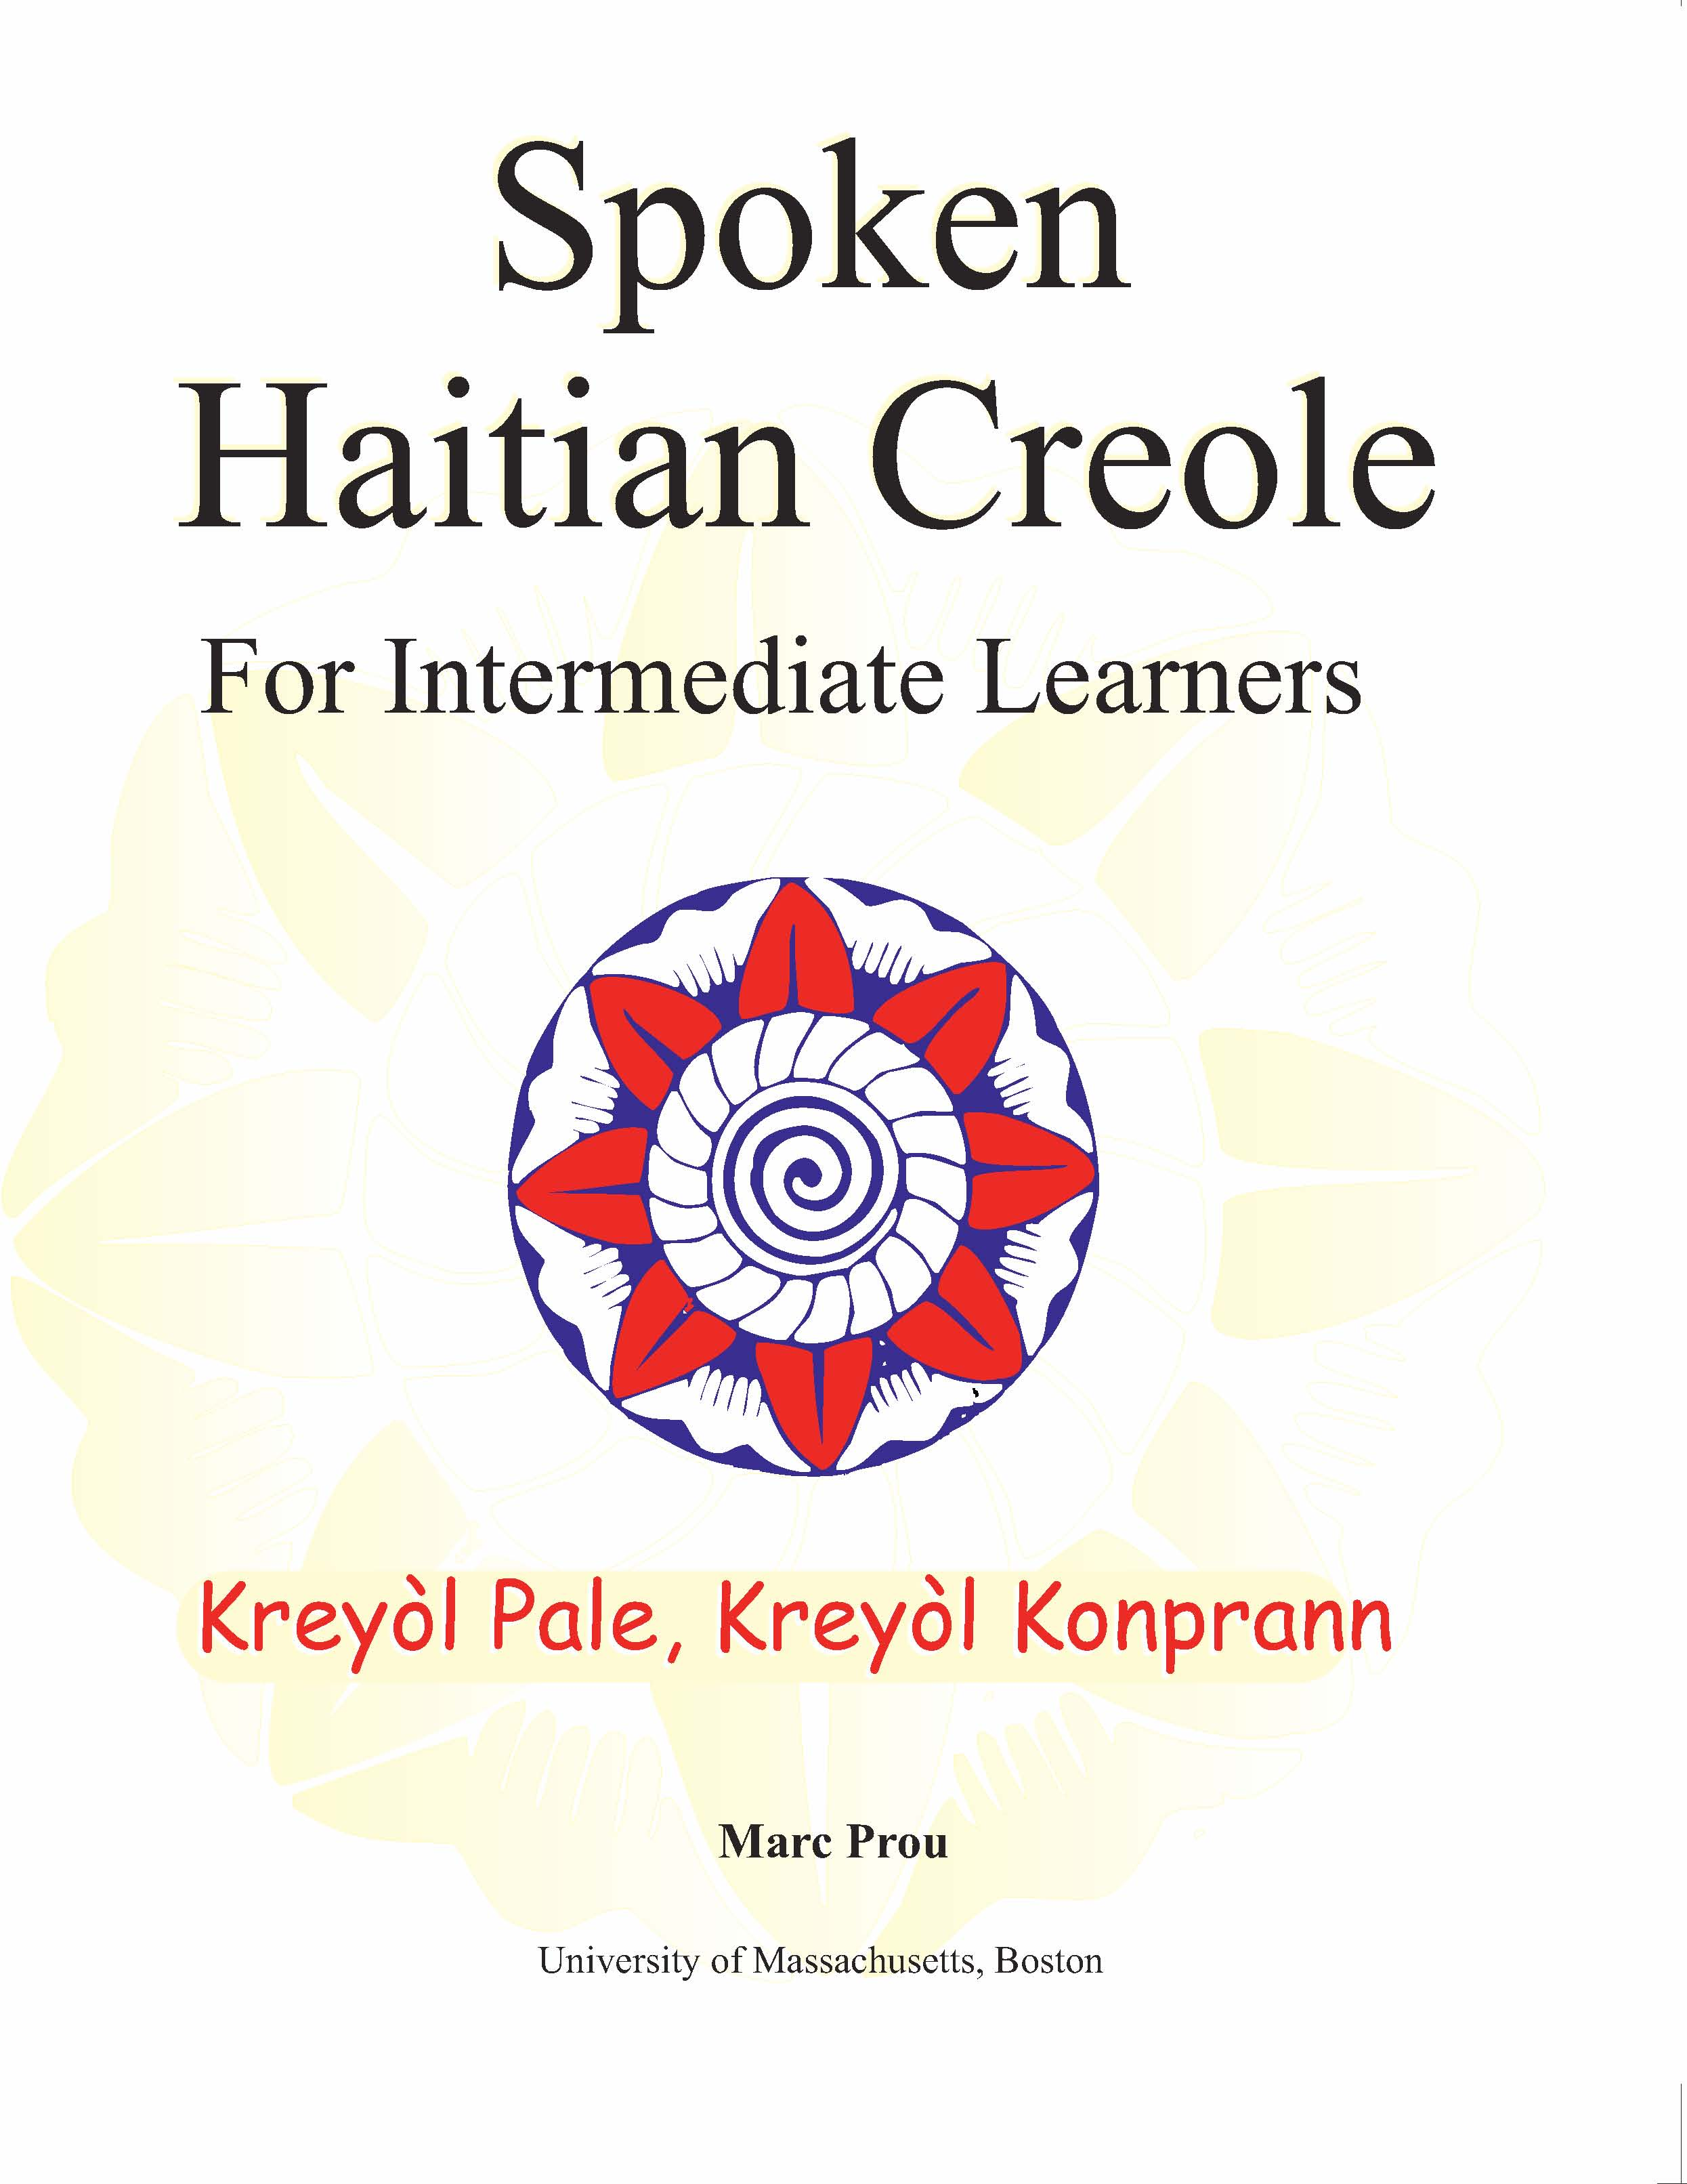 Spoken Haitian Creole (Kreyol Pale)